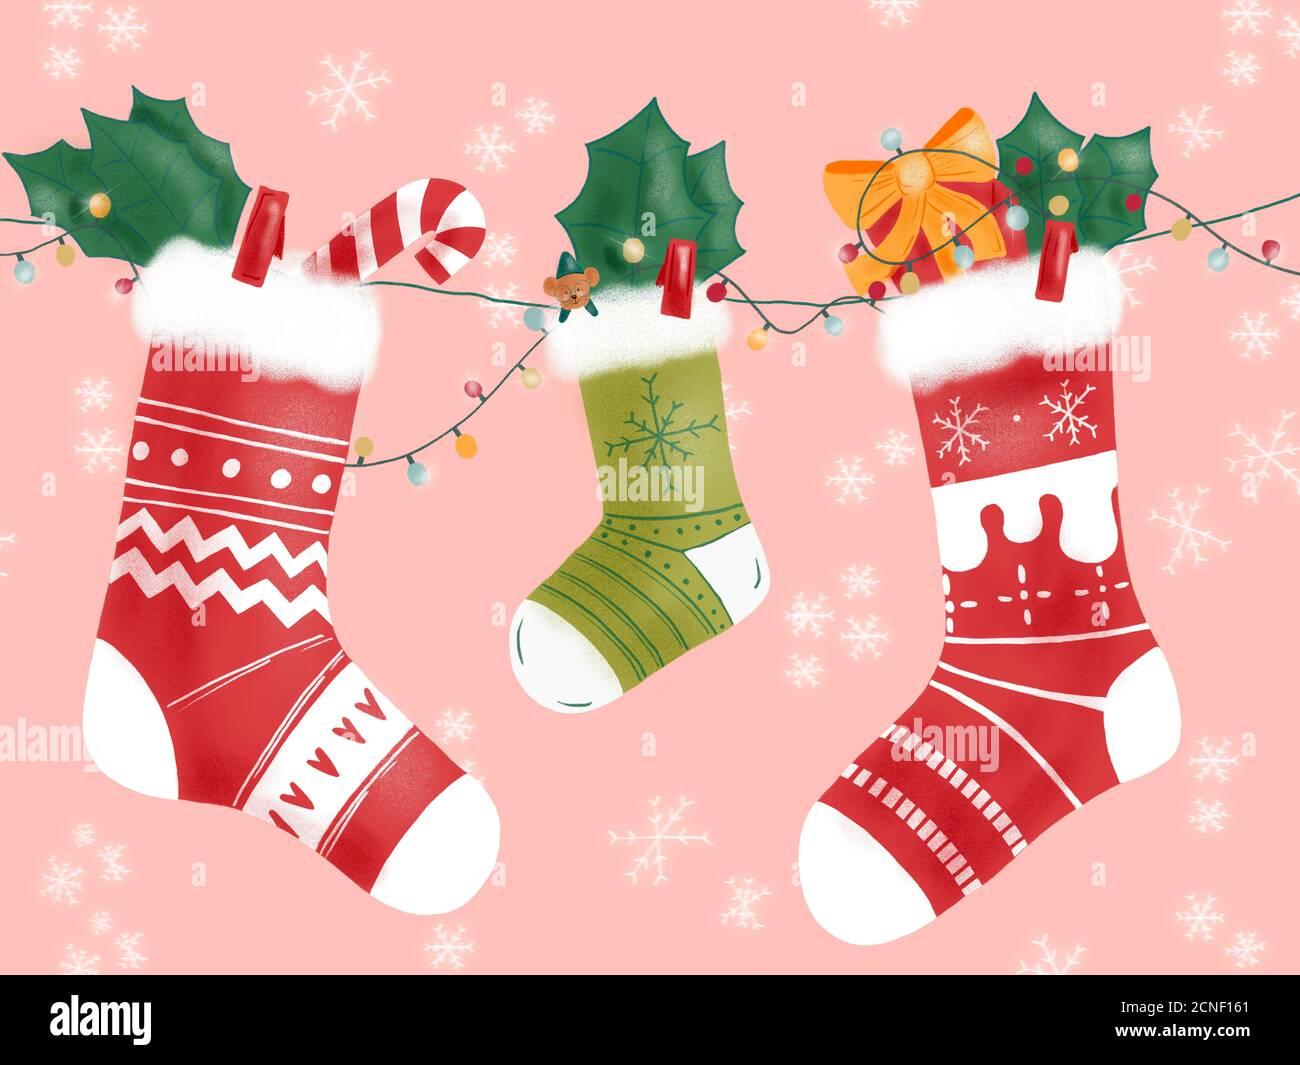 Hand-draw illustration of three winter socks hanging on Christmas decoration Stock Photo